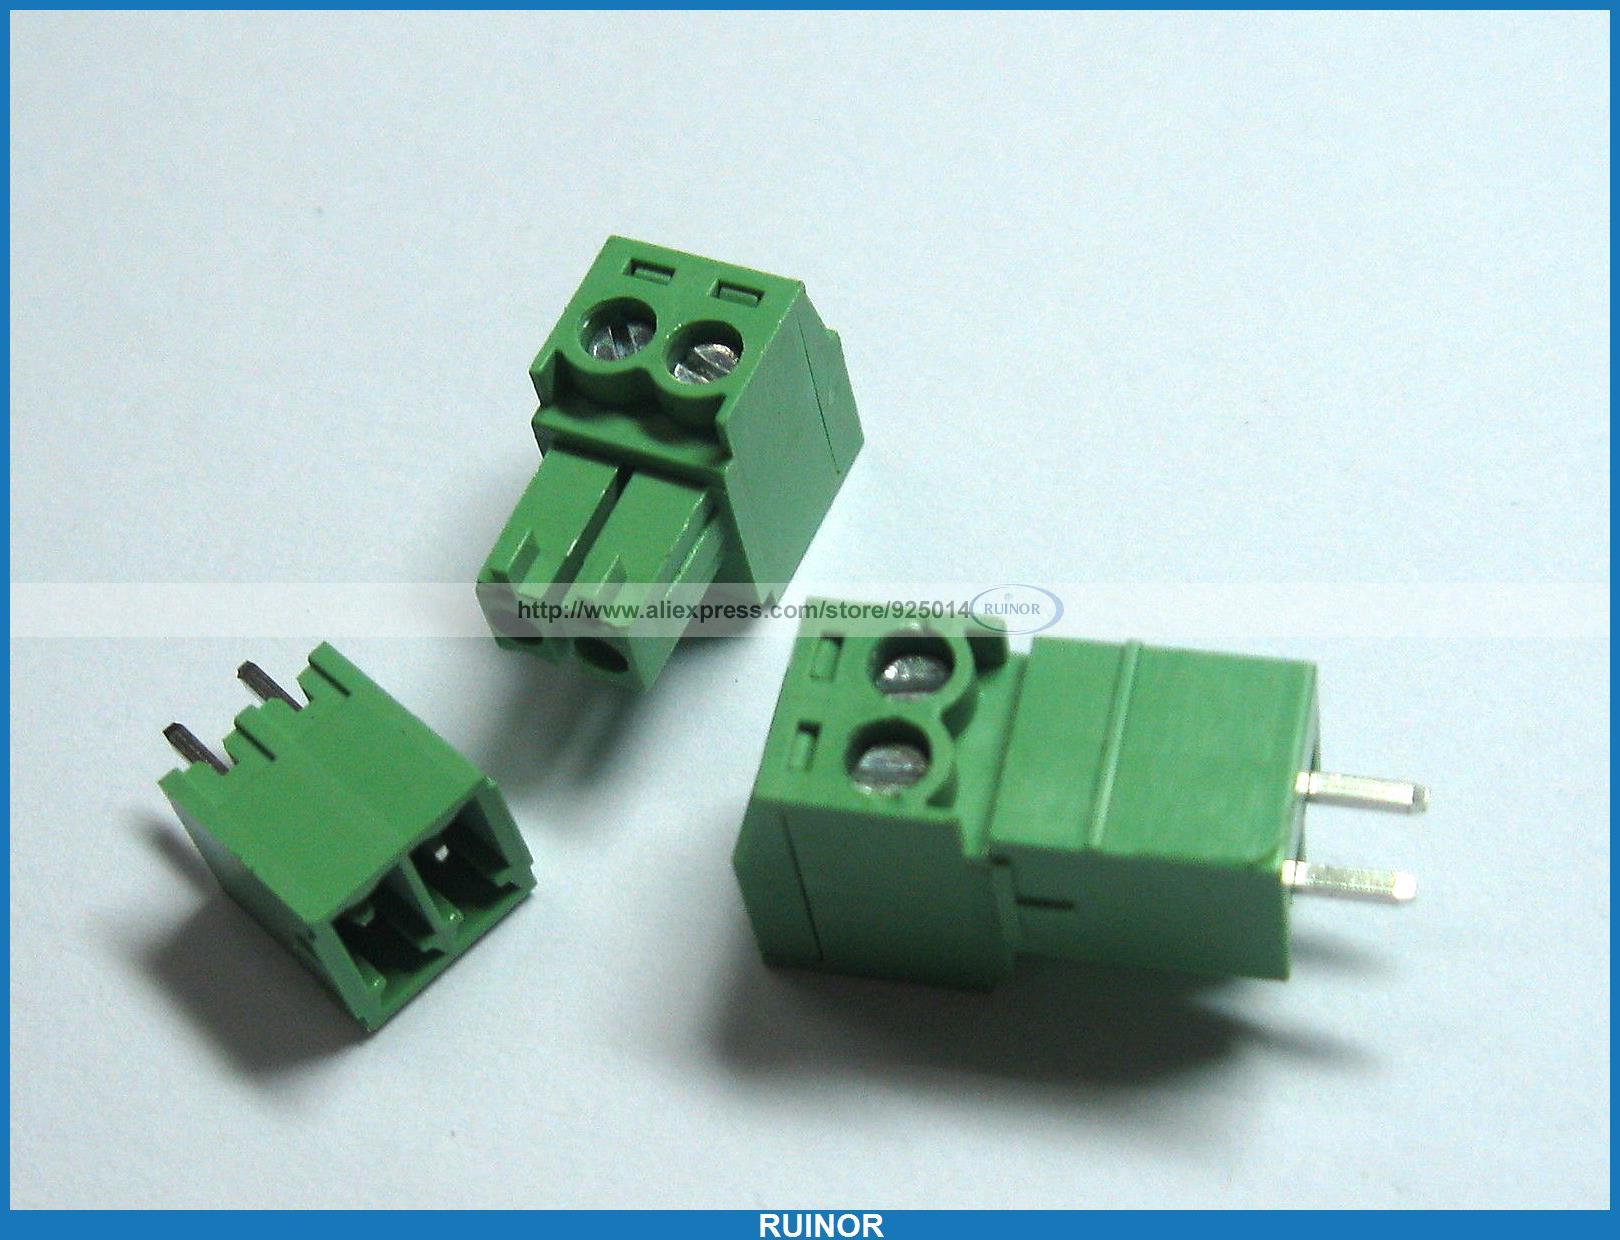 ФОТО 150 Pcs Screw Terminal Block Connector 3.5mm 2 Pin Way Green Pluggable Type